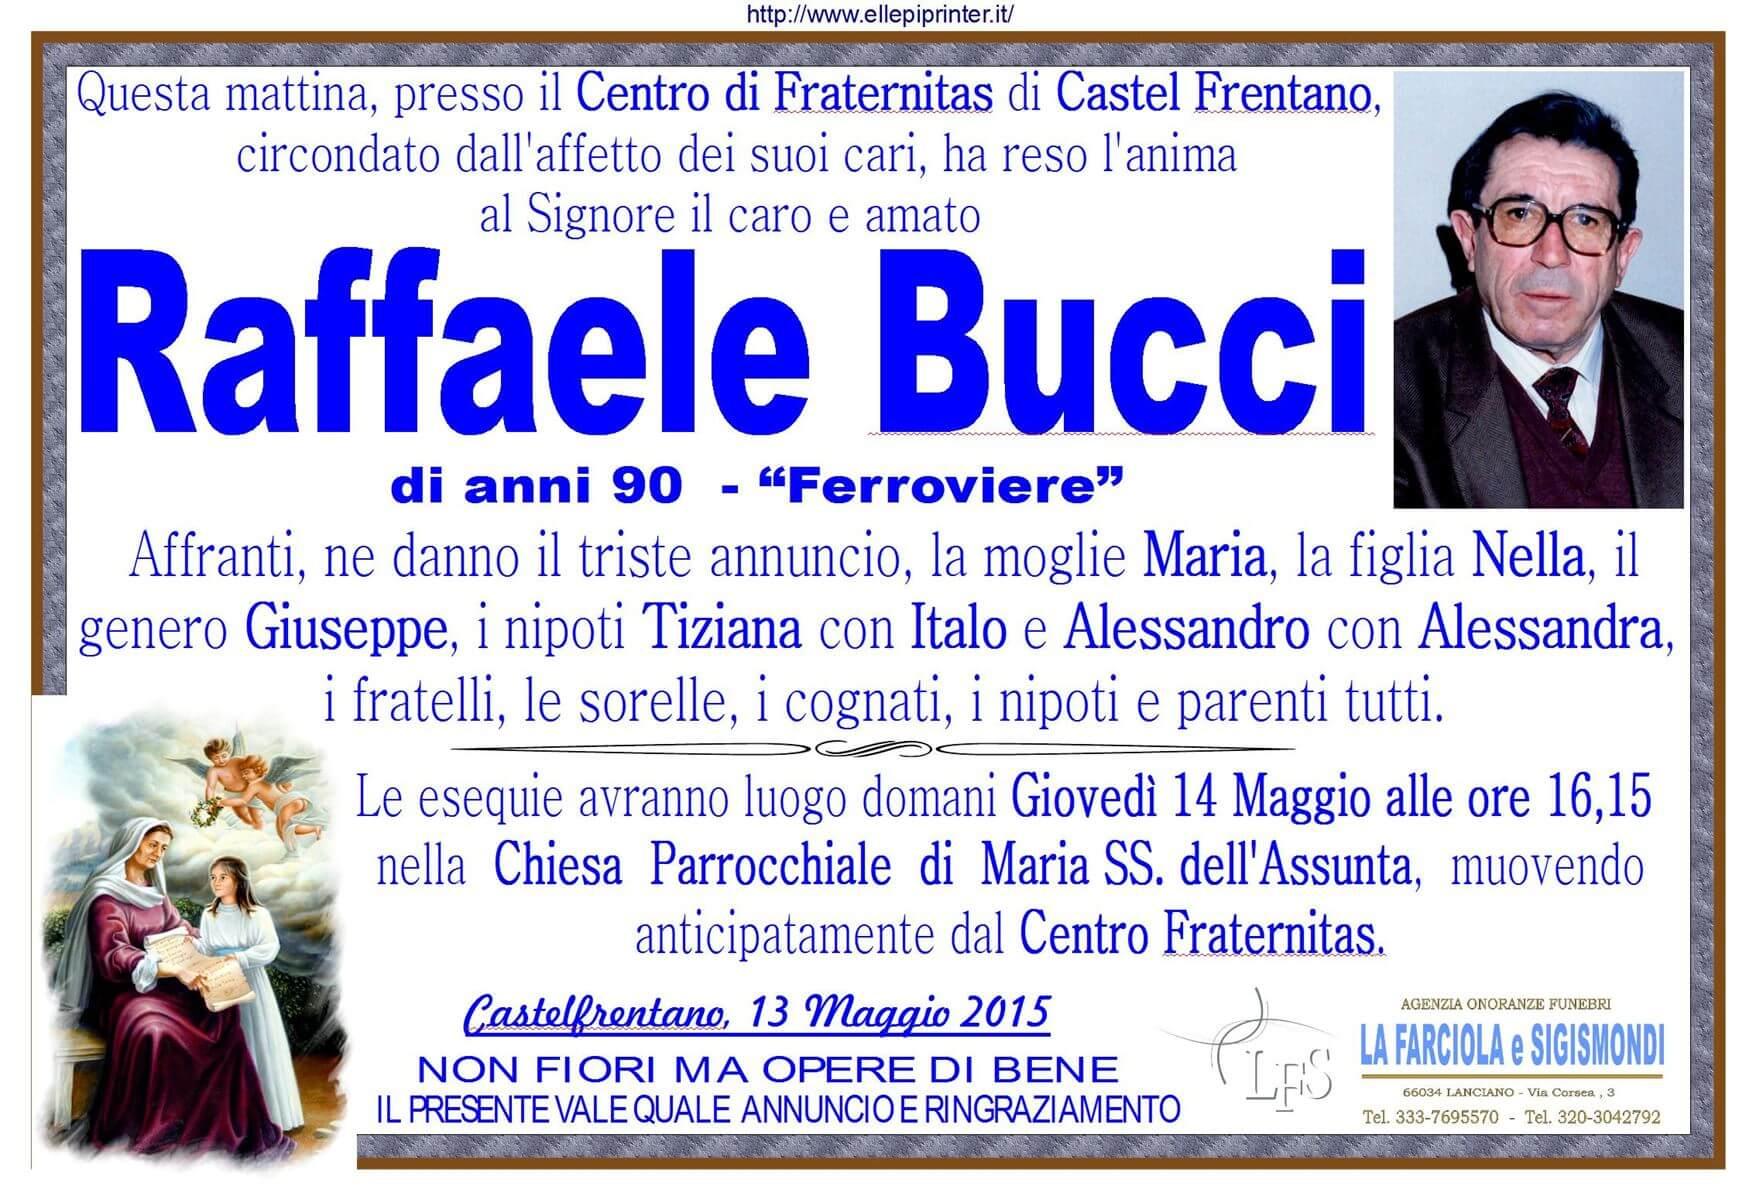 MANIFESTO BUCCI RAFFAELE